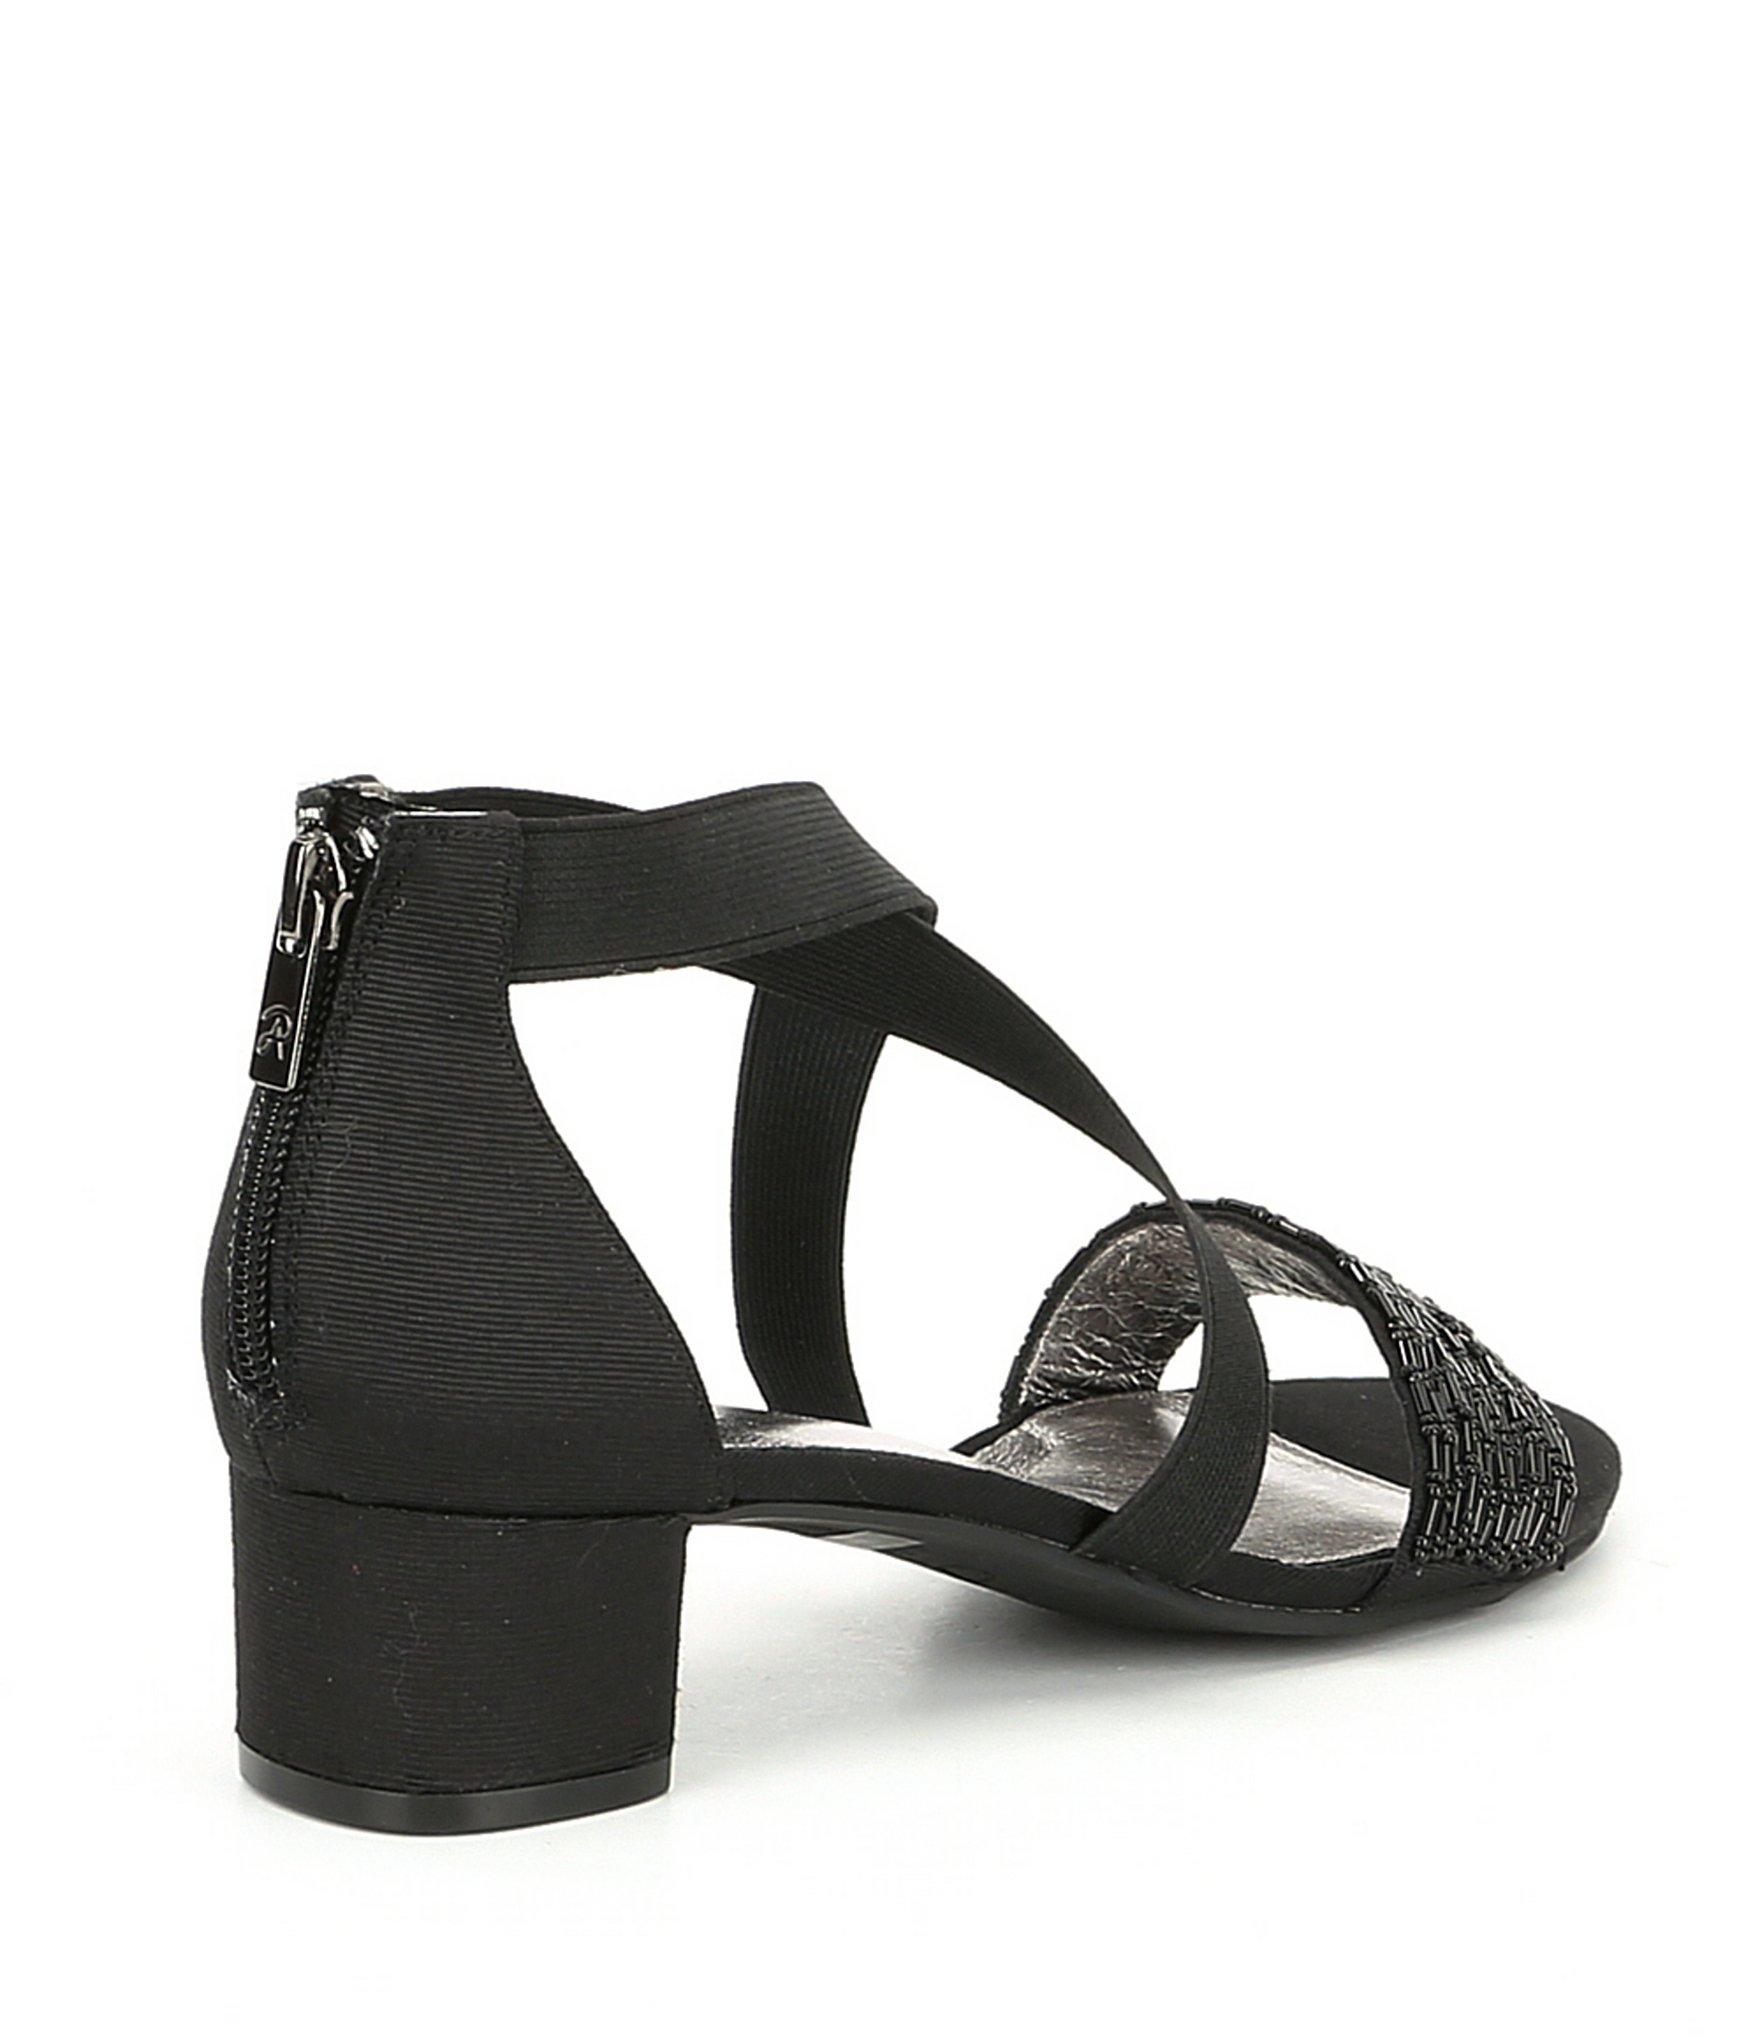 e8a25ada6 Adrianna Papell - Black Teagan Beaded Block Heel Dress Sandals - Lyst. View  fullscreen